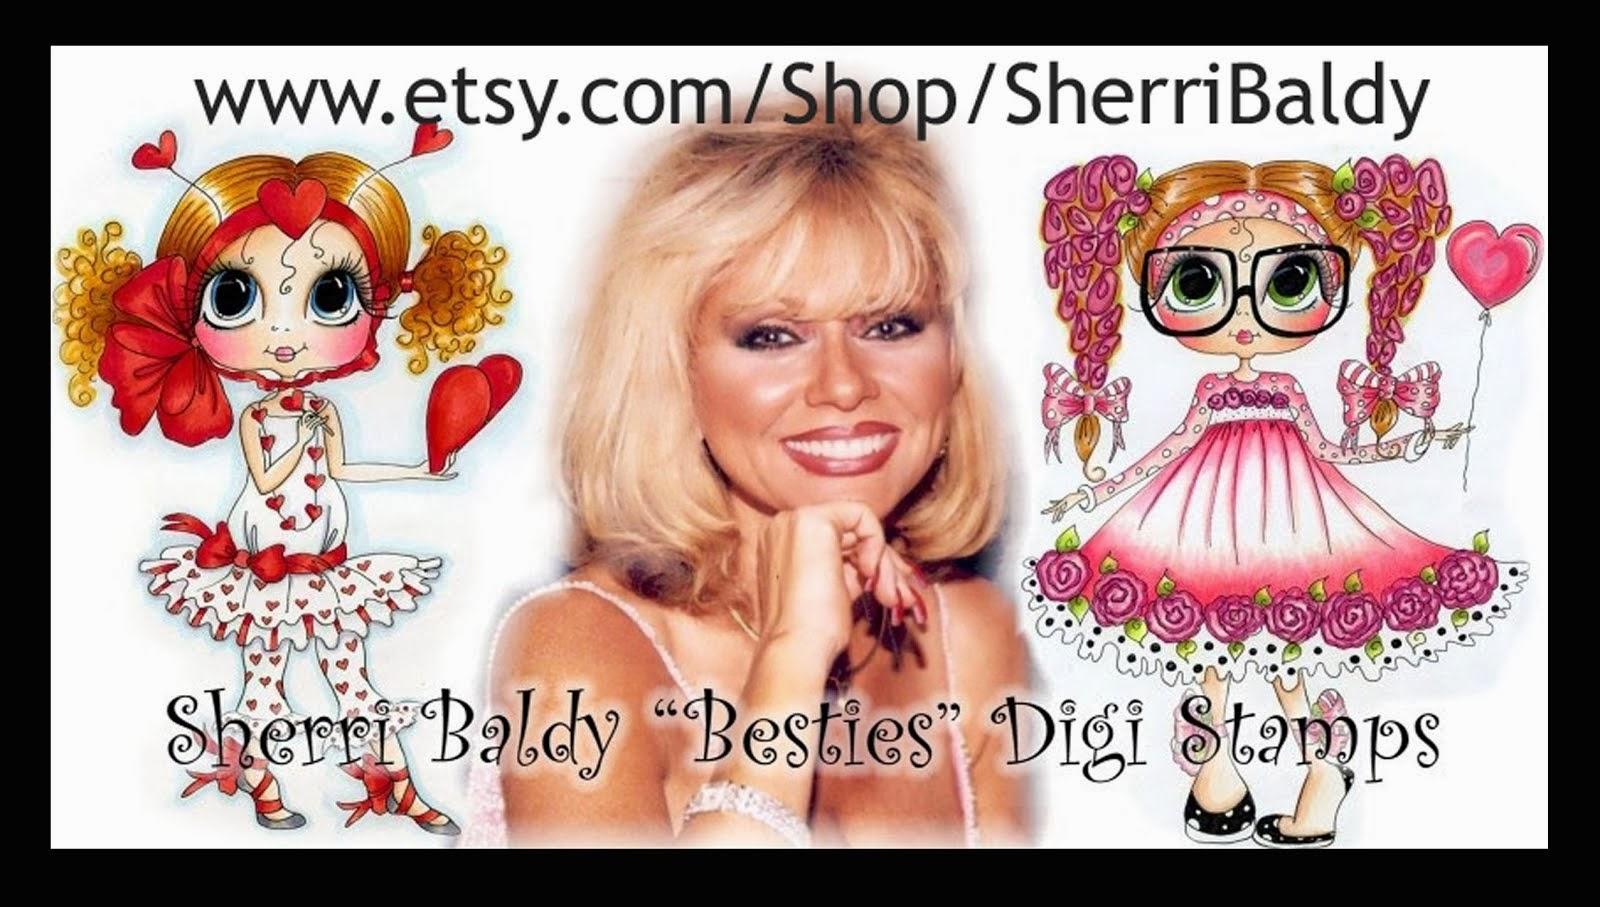 Sherri Baldy's Besties